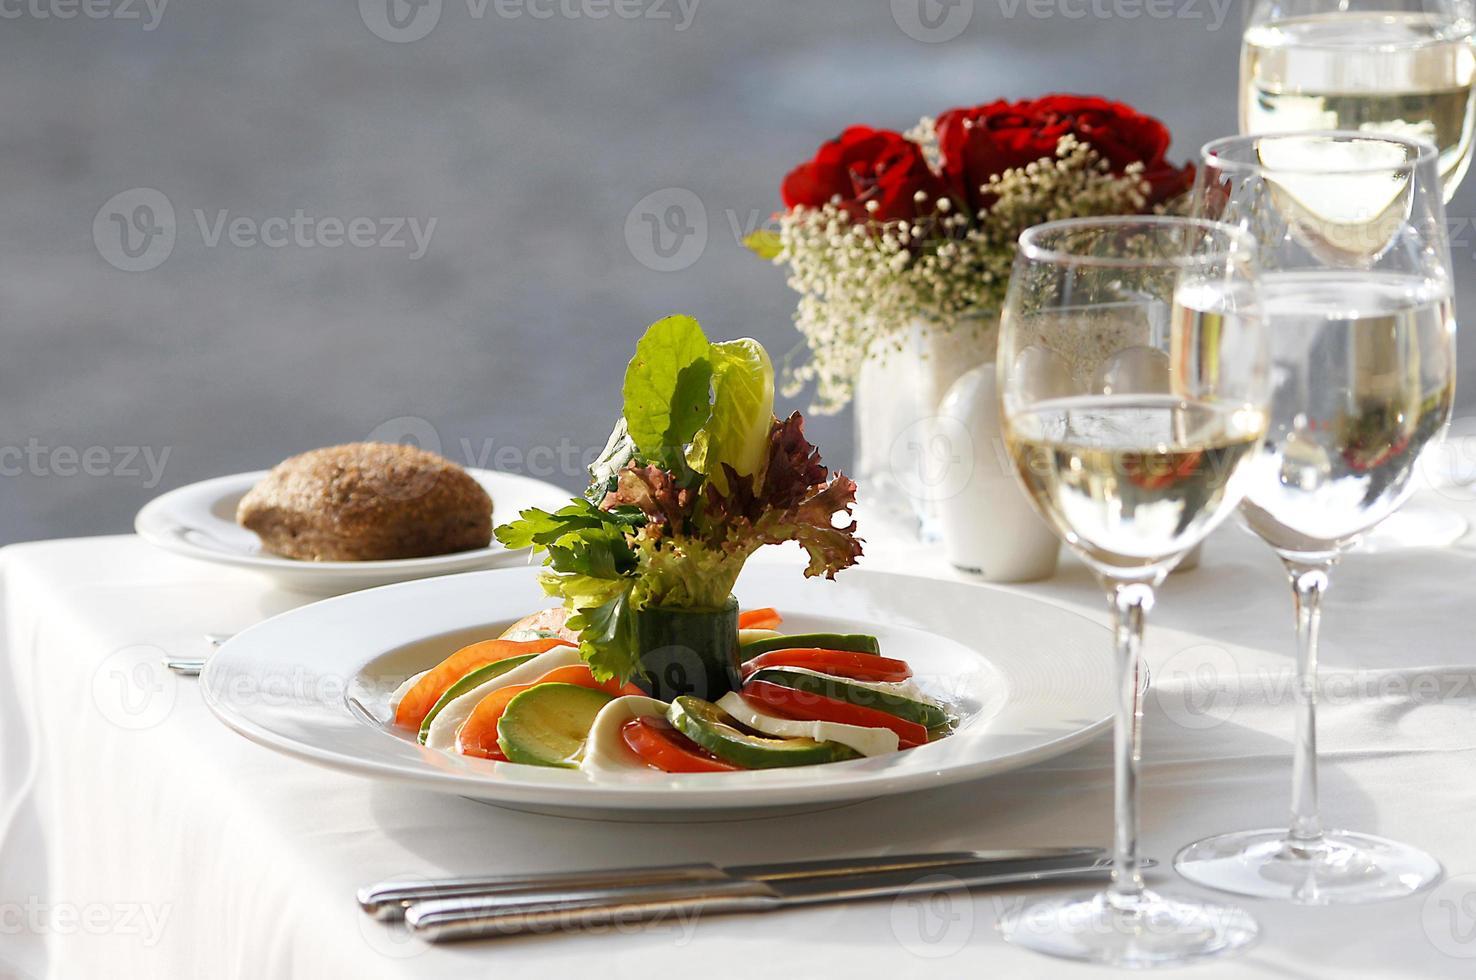 caprese salade met tomaten, mozzarella en basilicum. foto